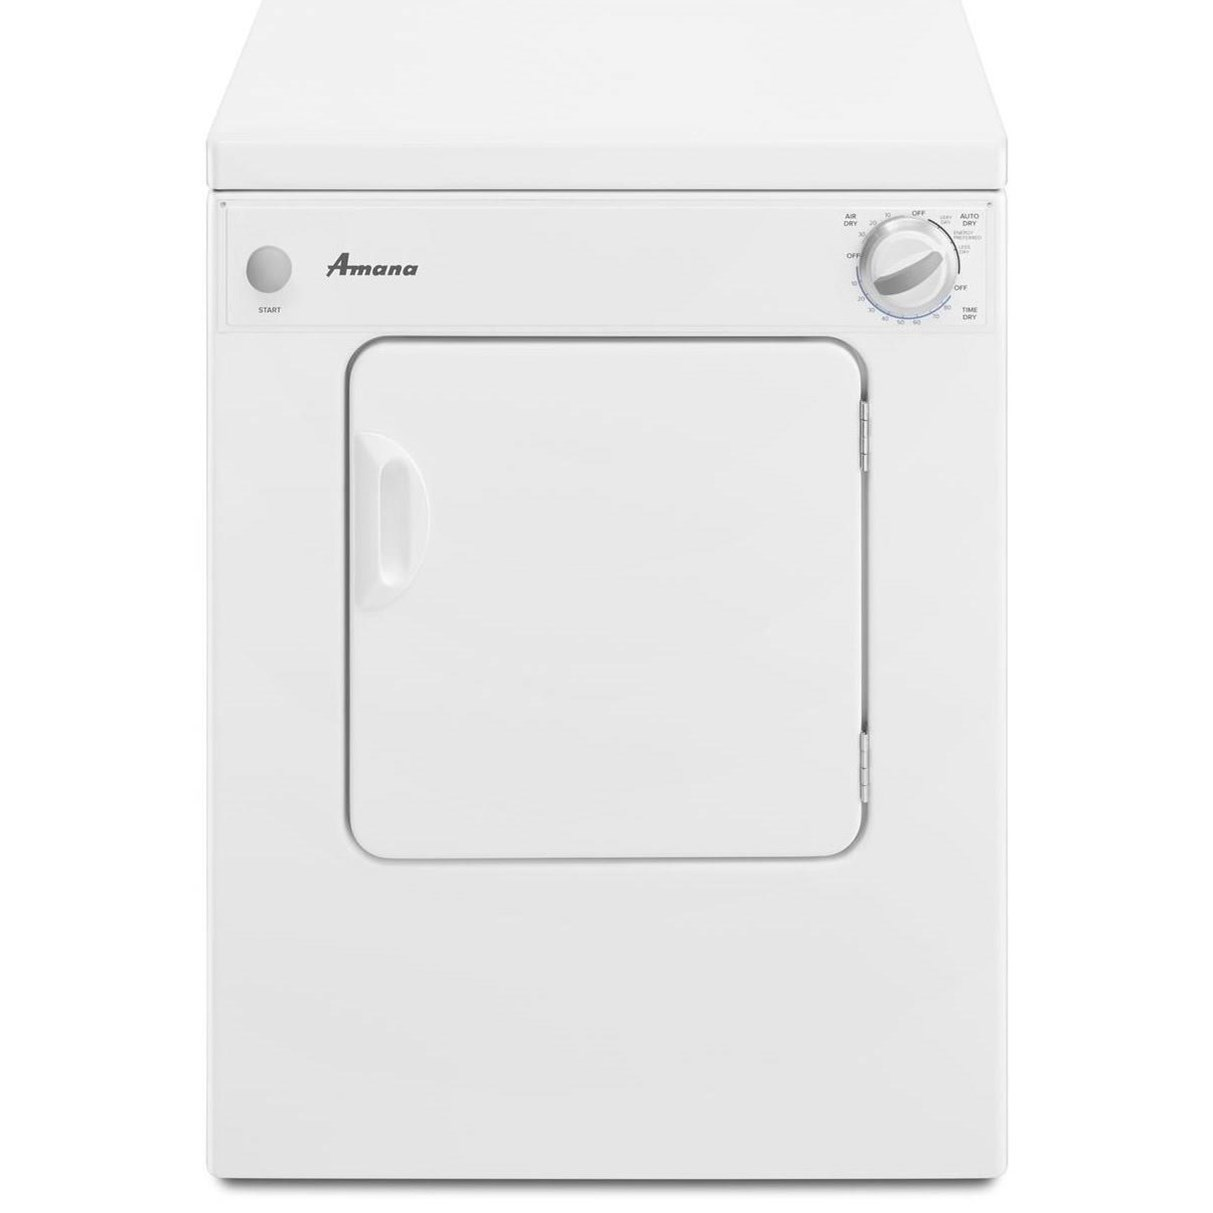 Amana Dryers 3.4 cu. ft. Compact Dryer - Item Number: NEC3240FW